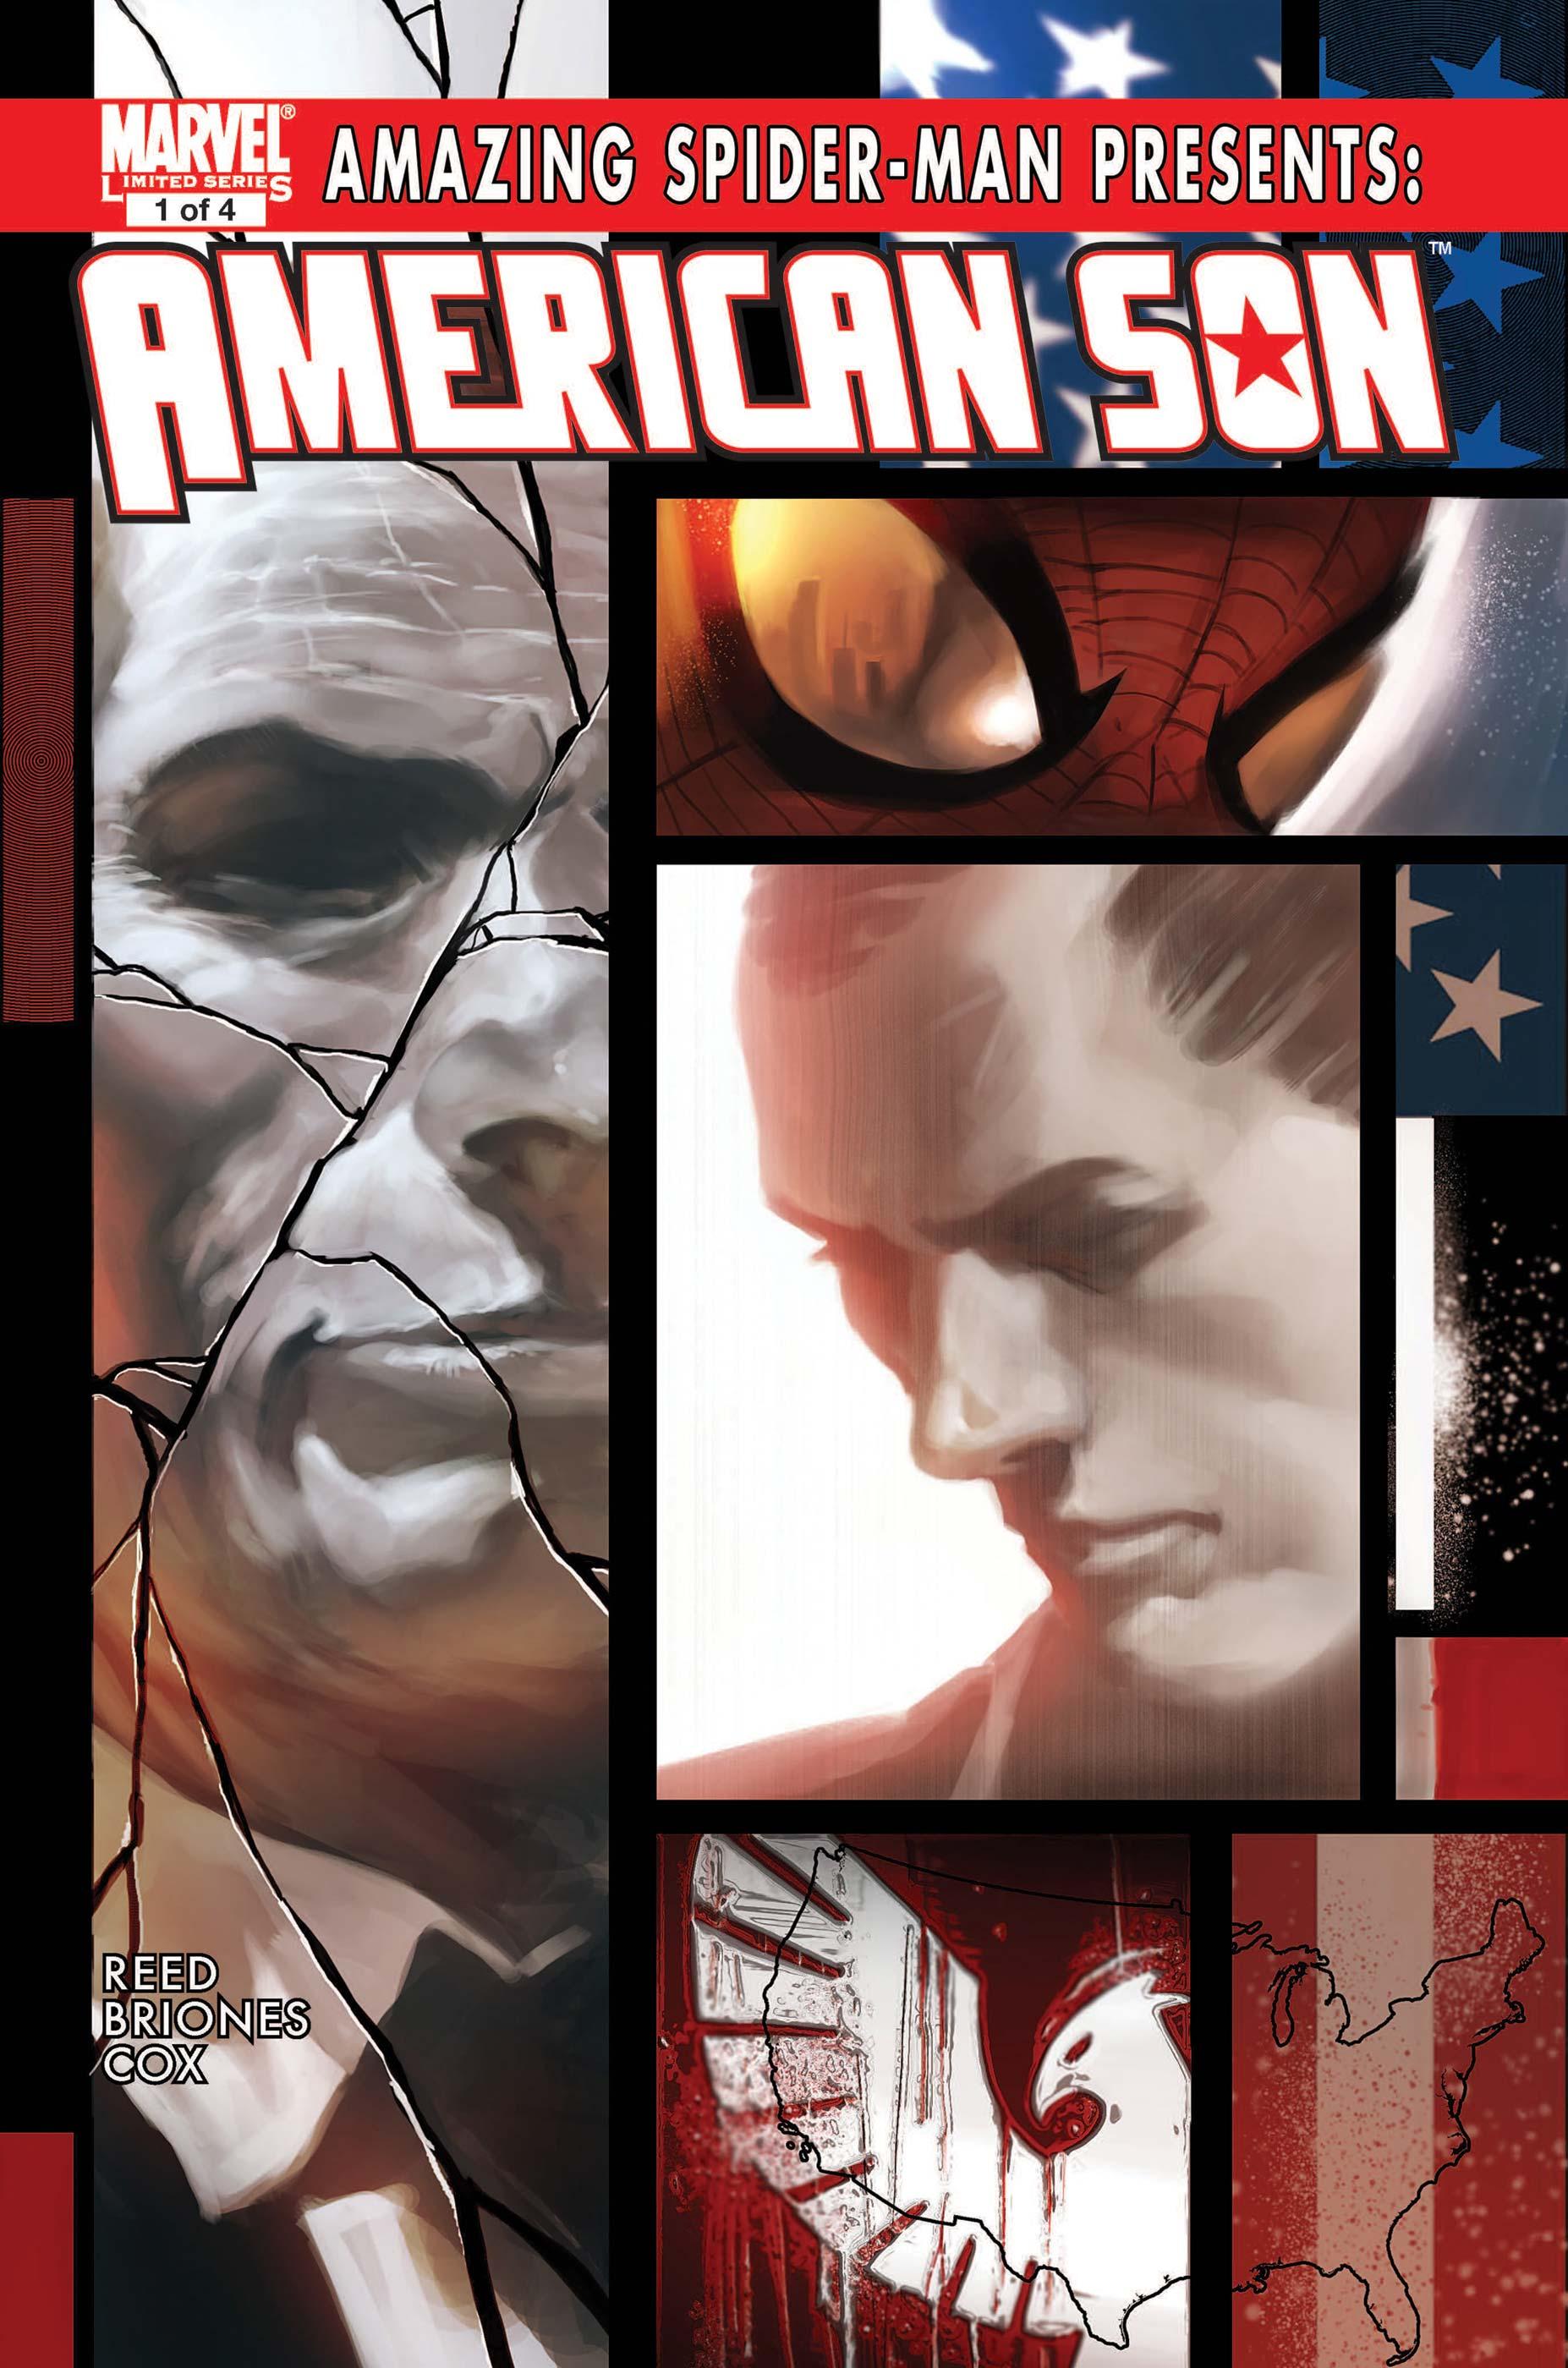 Amazing Spider-Man Presents: American Son (2010) #1